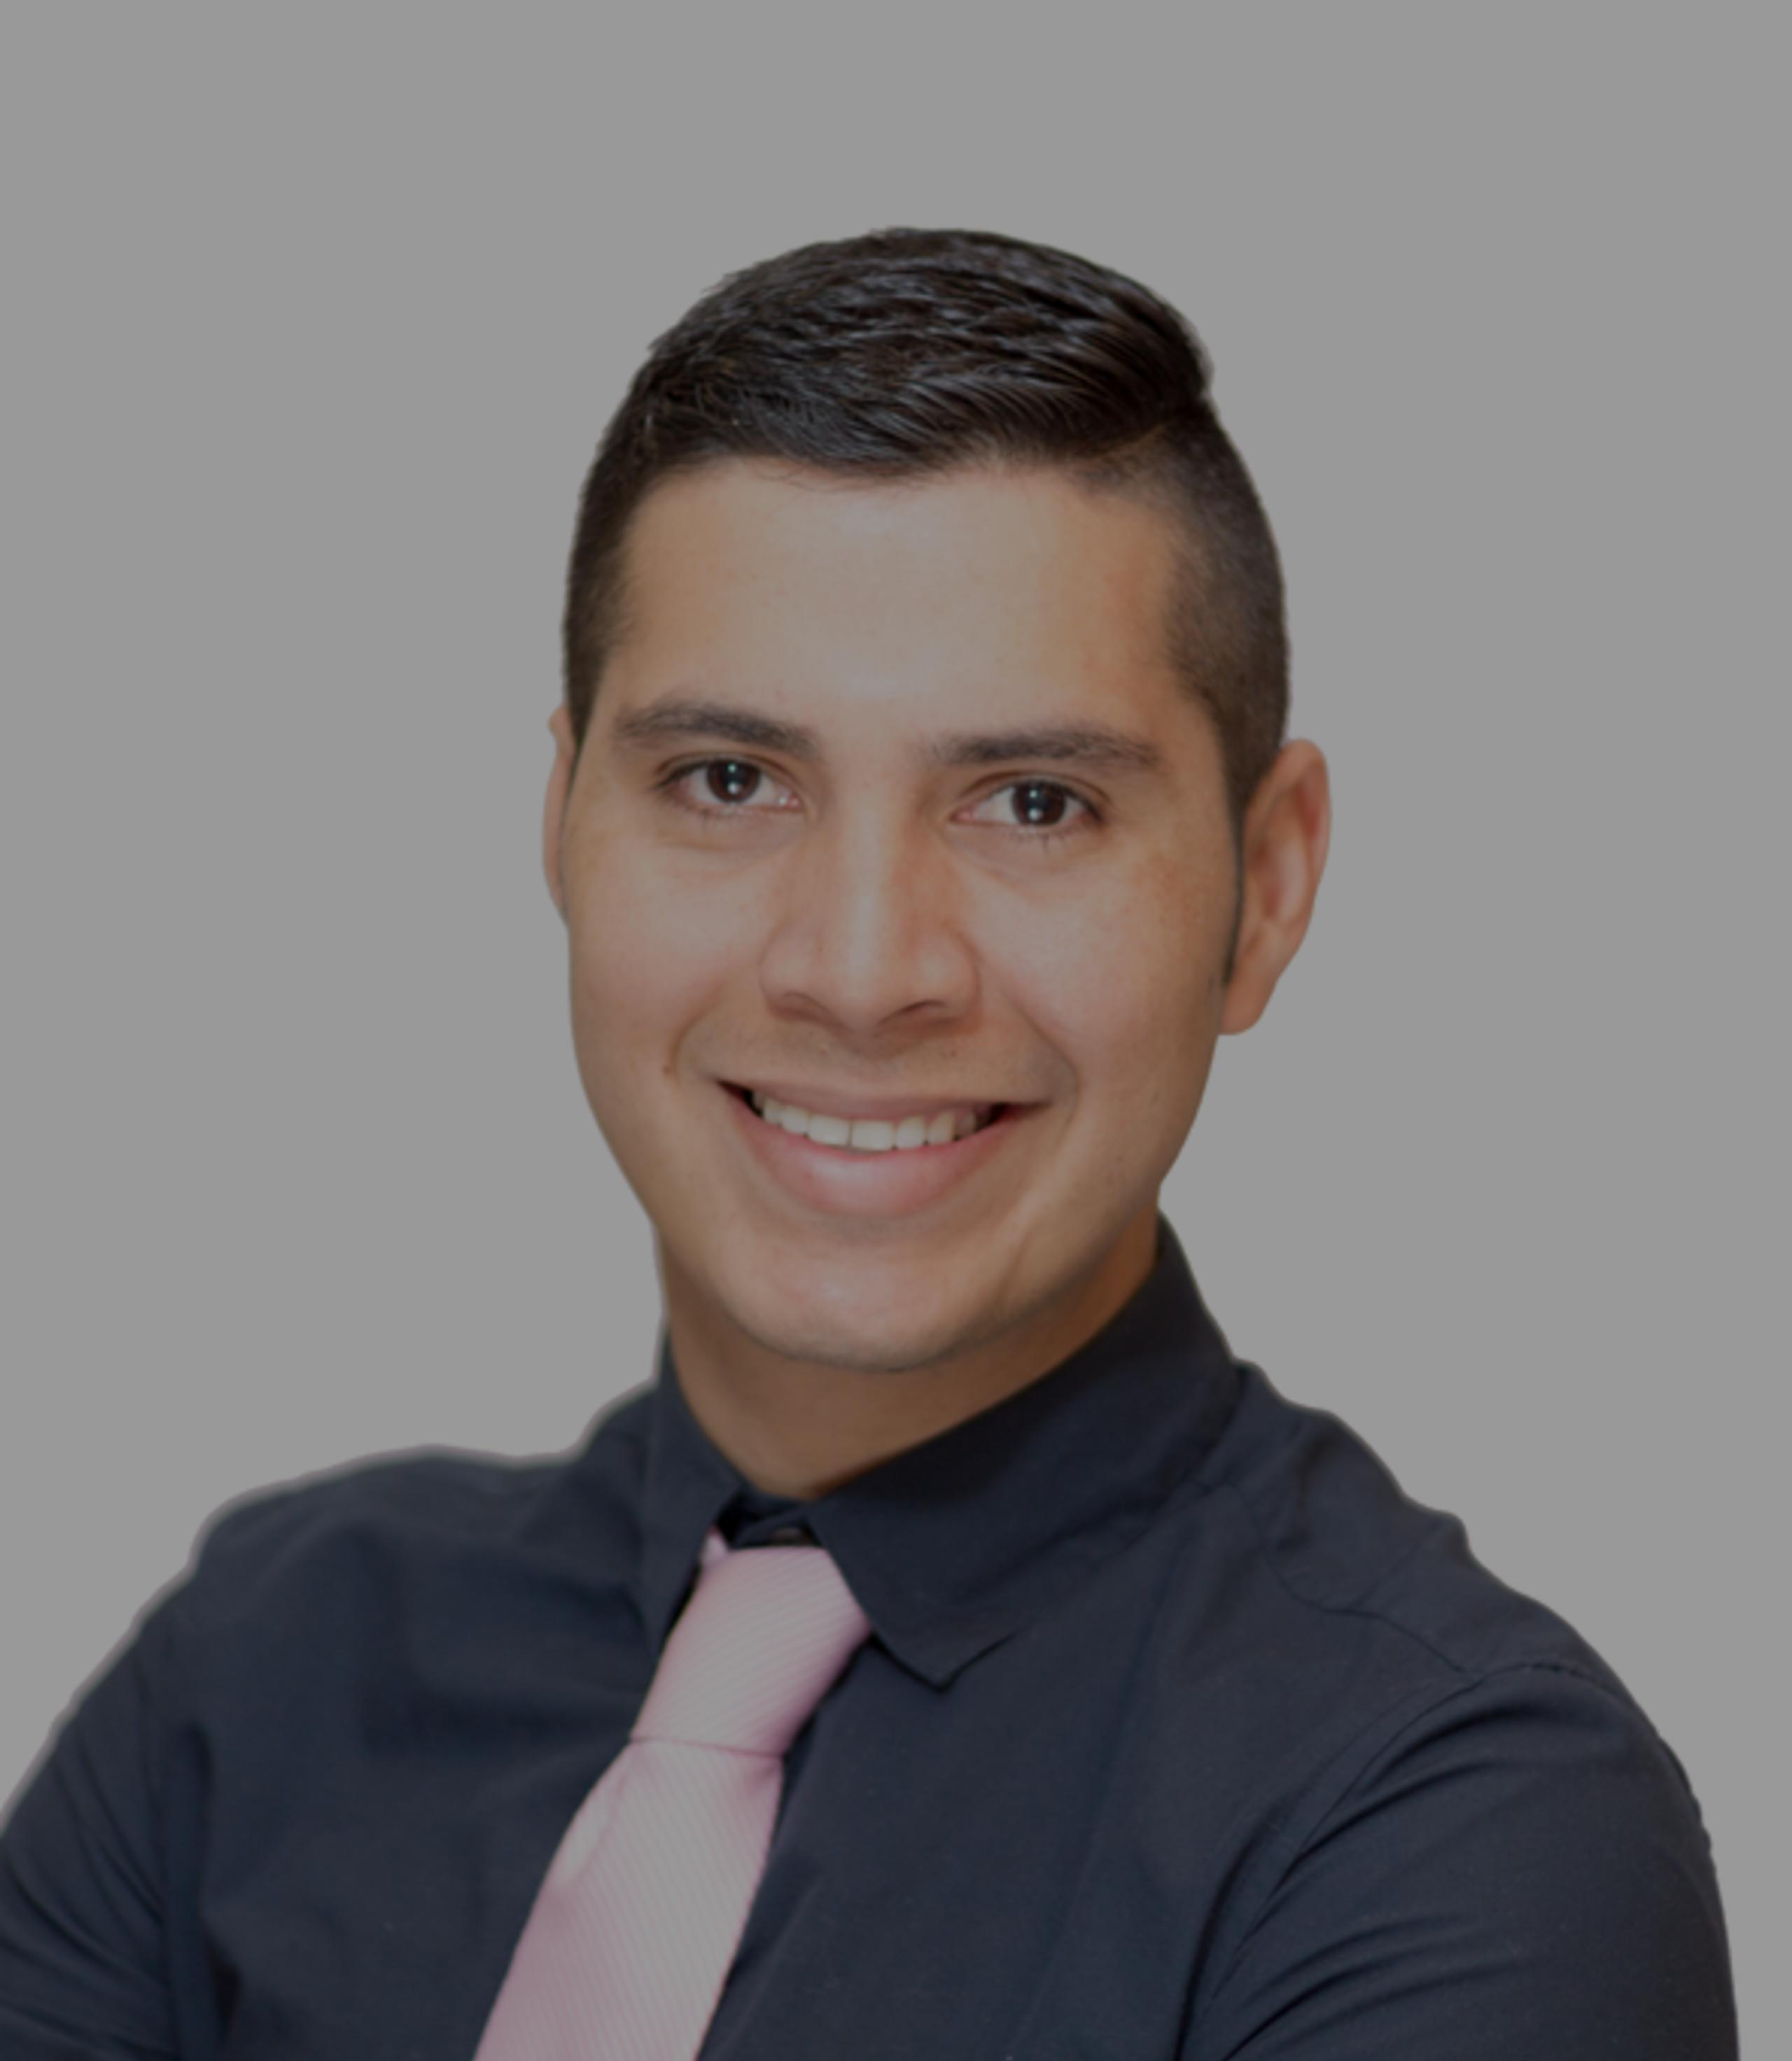 MRE | AP Welcomes New Agent David Pena